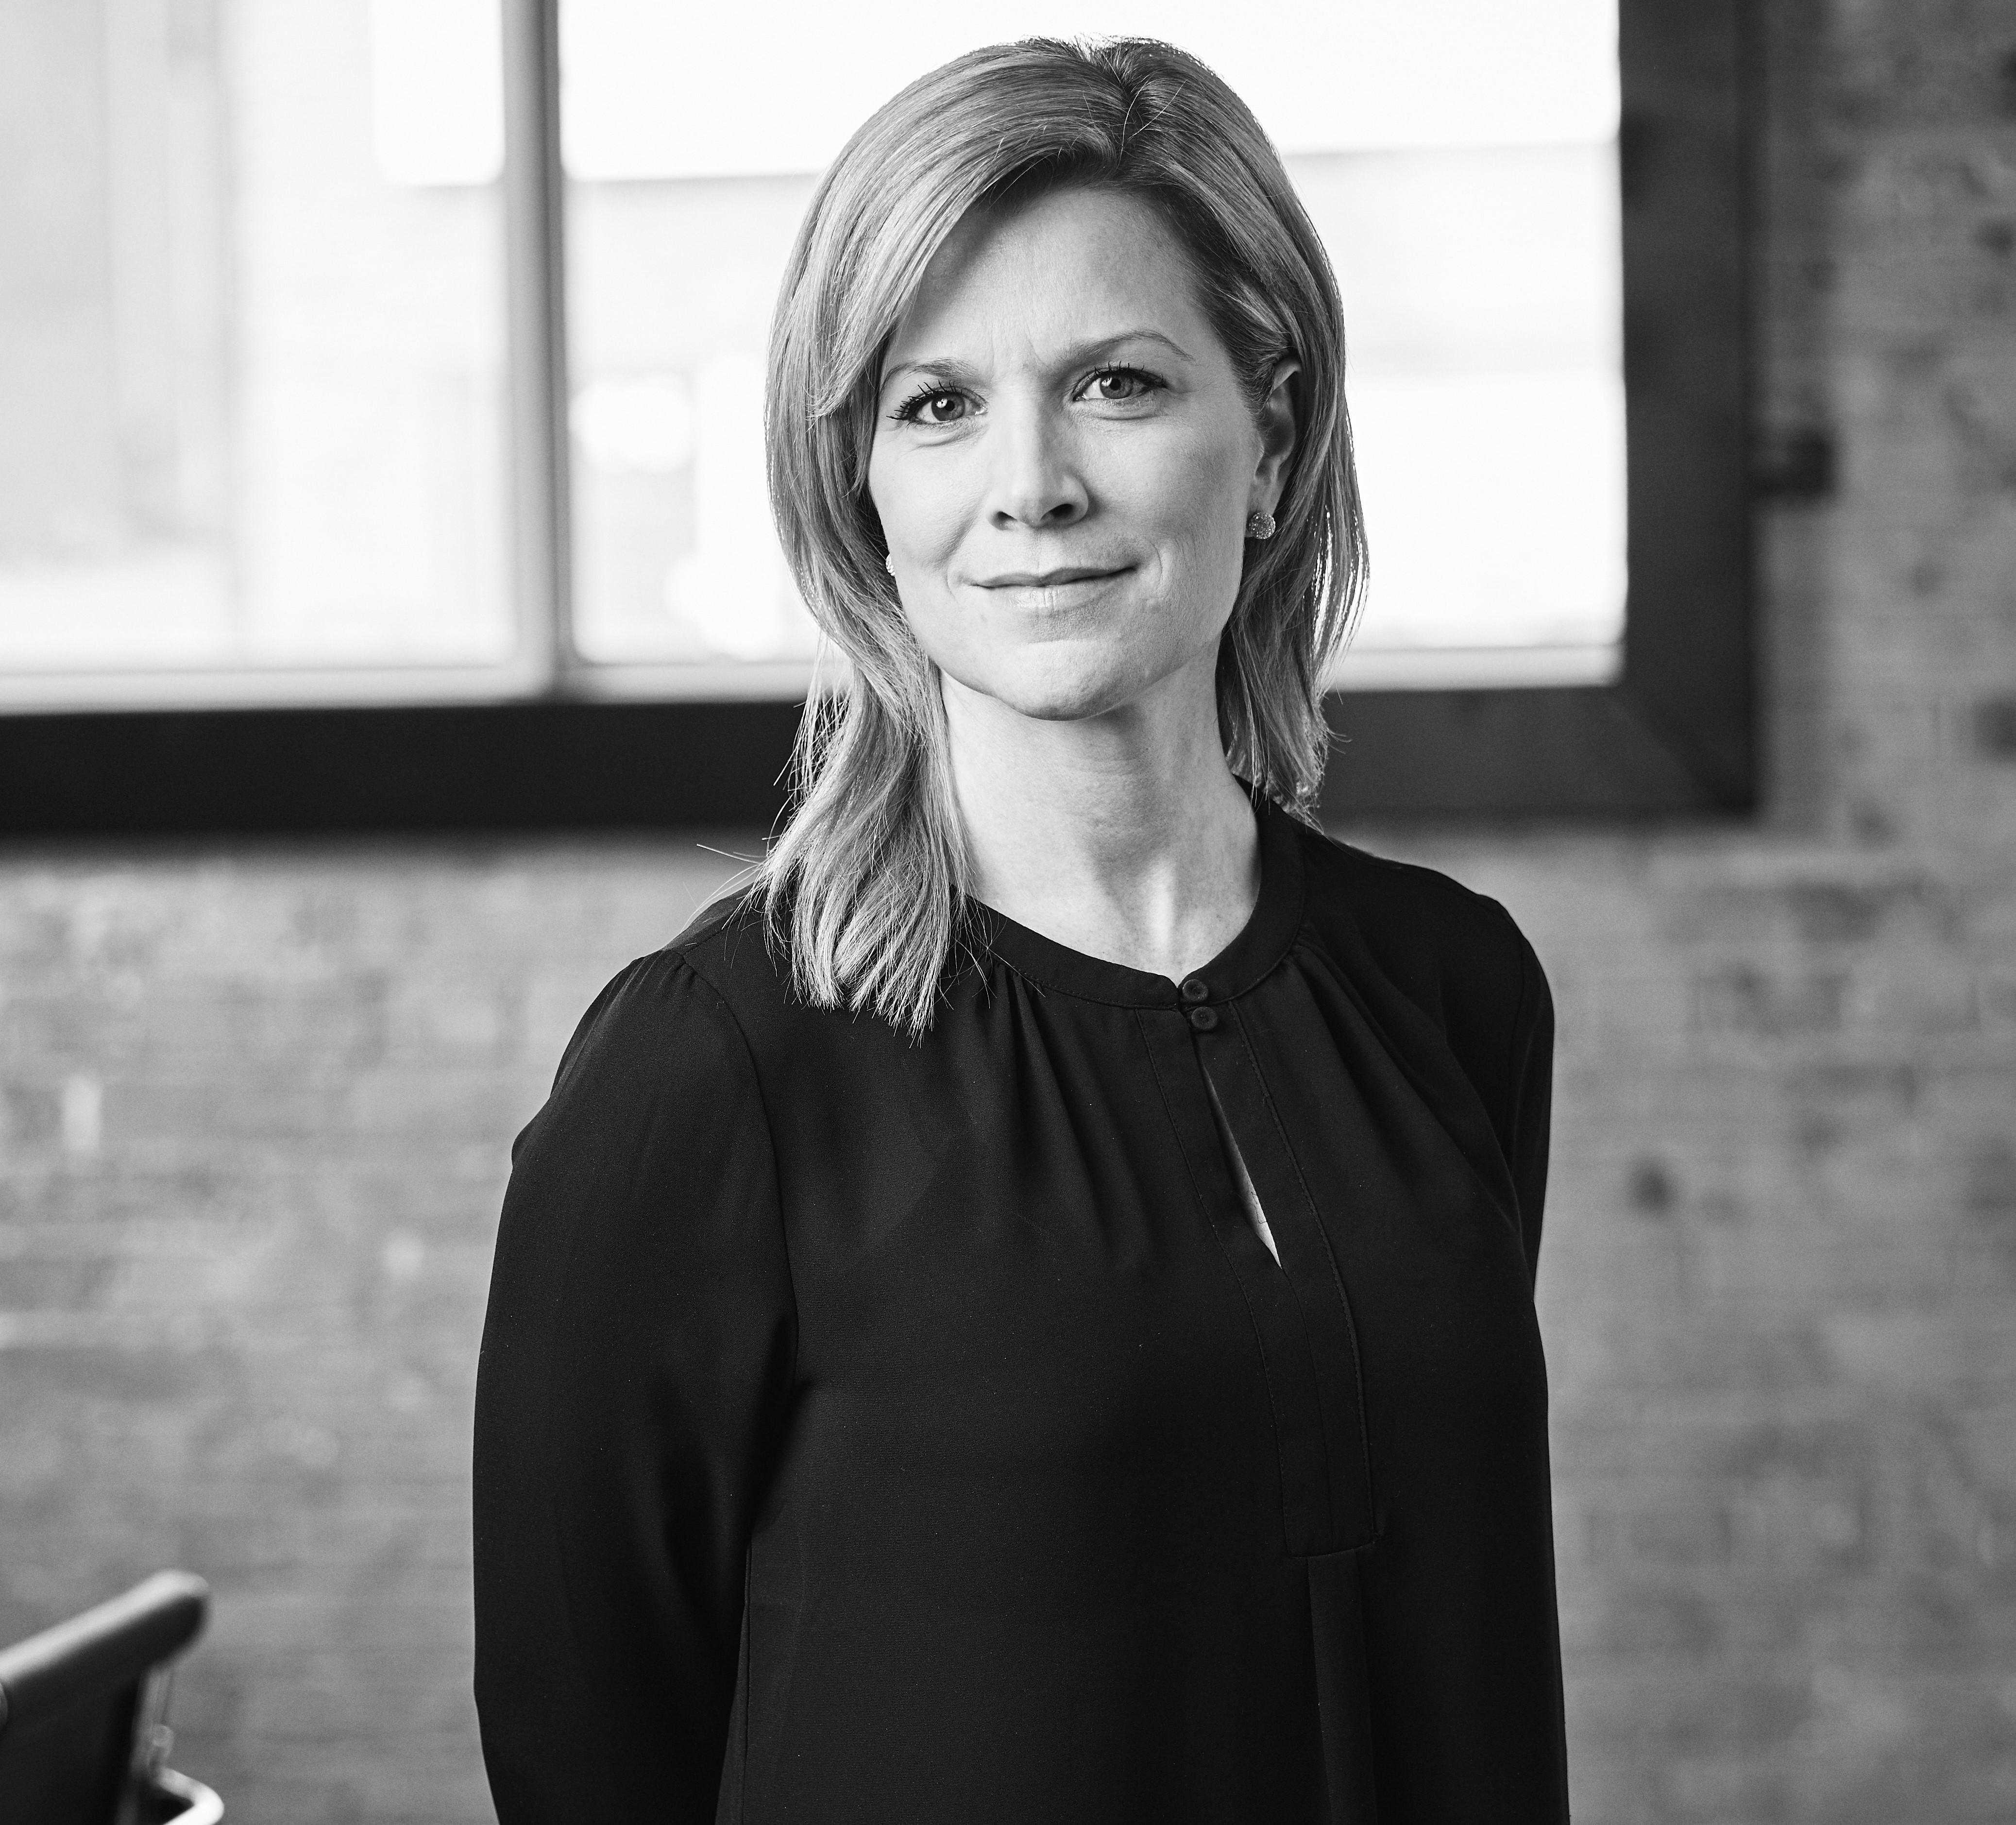 Thrive Staff Portrait - Corinne - Feb 21 2018 _44805 -2